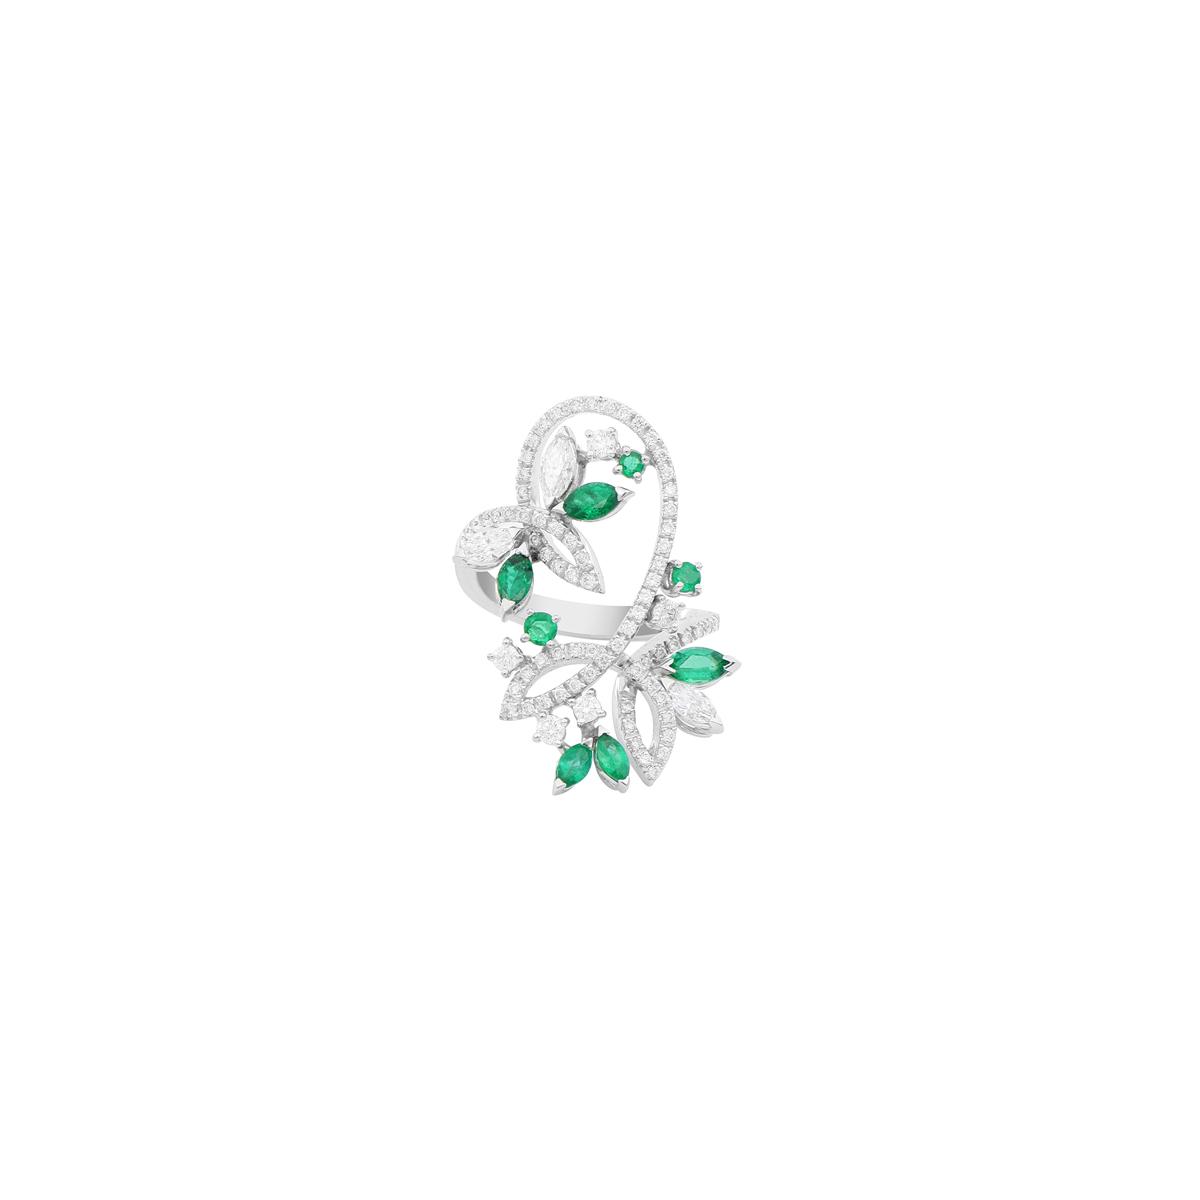 Emerald and Diamond Leaf Ring